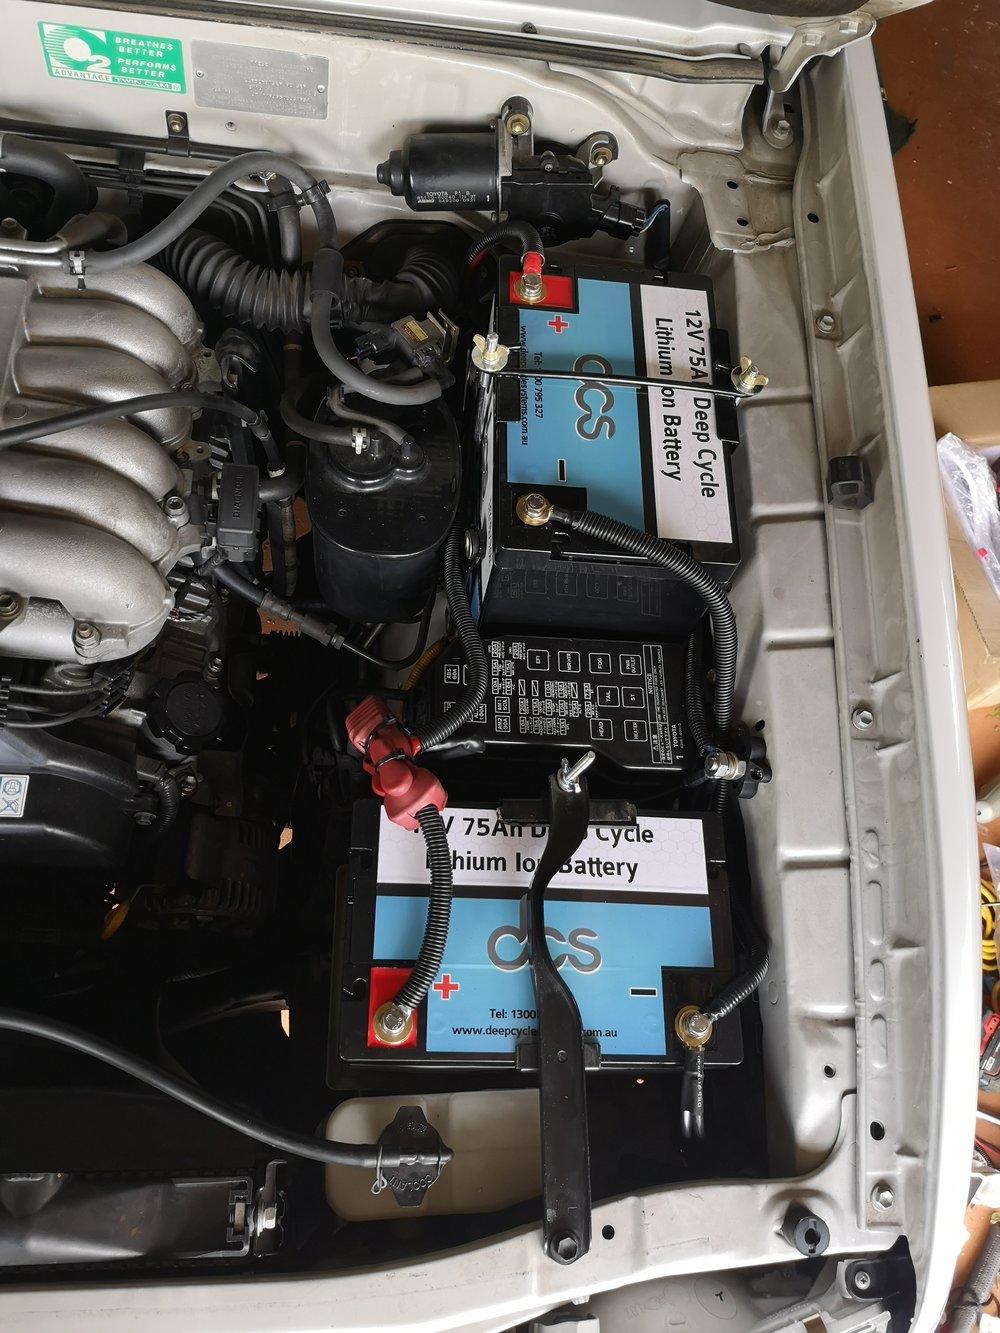 Prado 90 series - dual DCS lithium 75Ah batteries